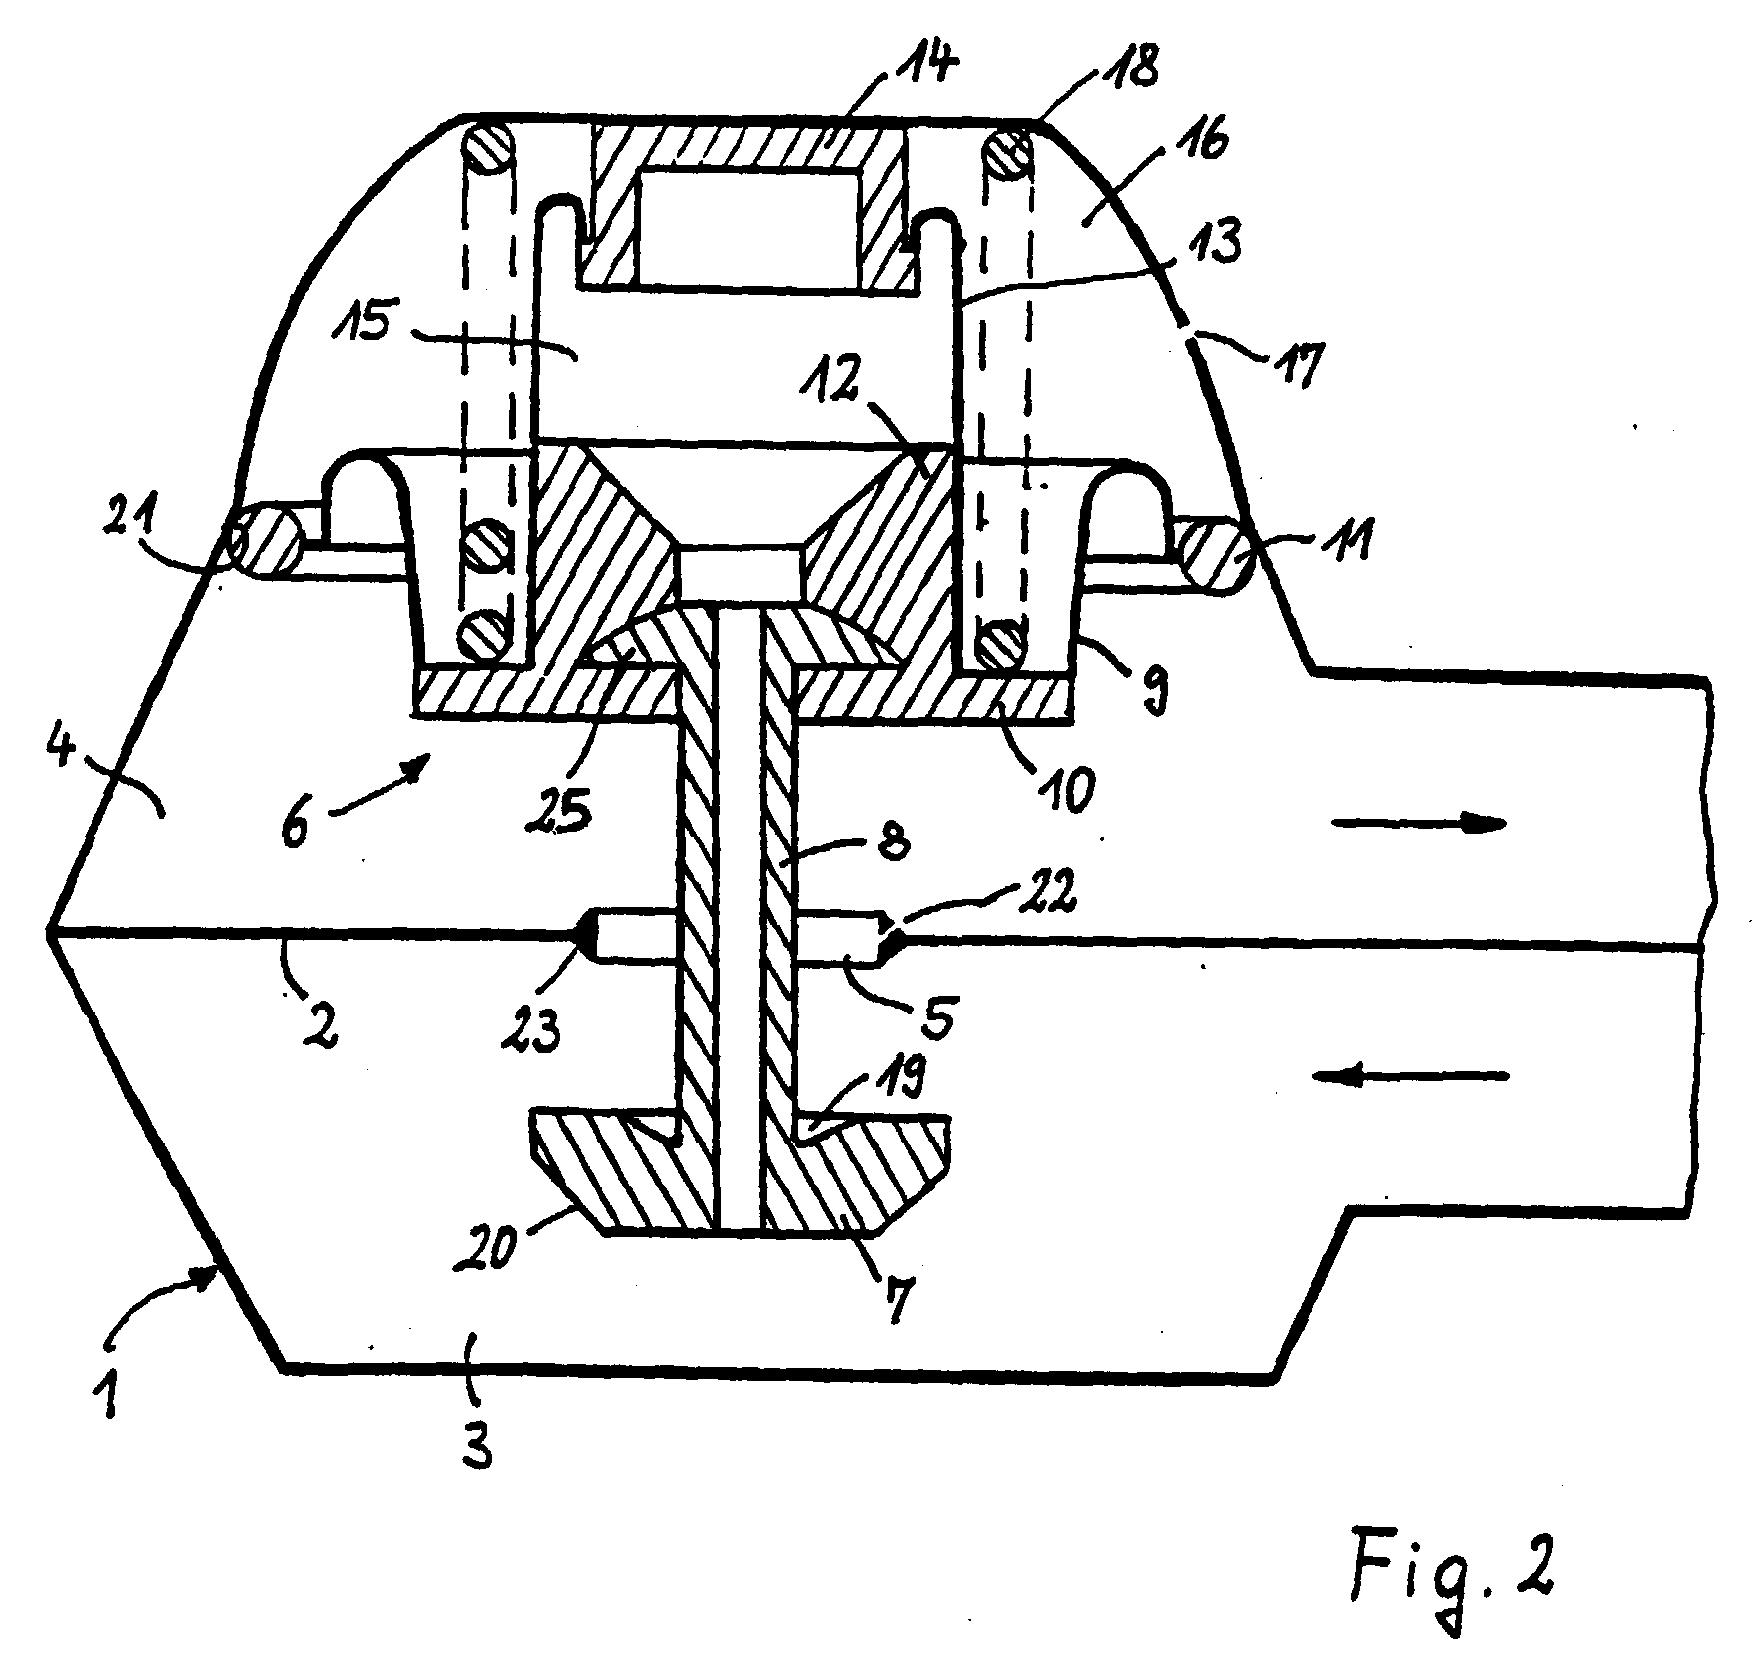 patente ep0892329a1 - gasdruckregler